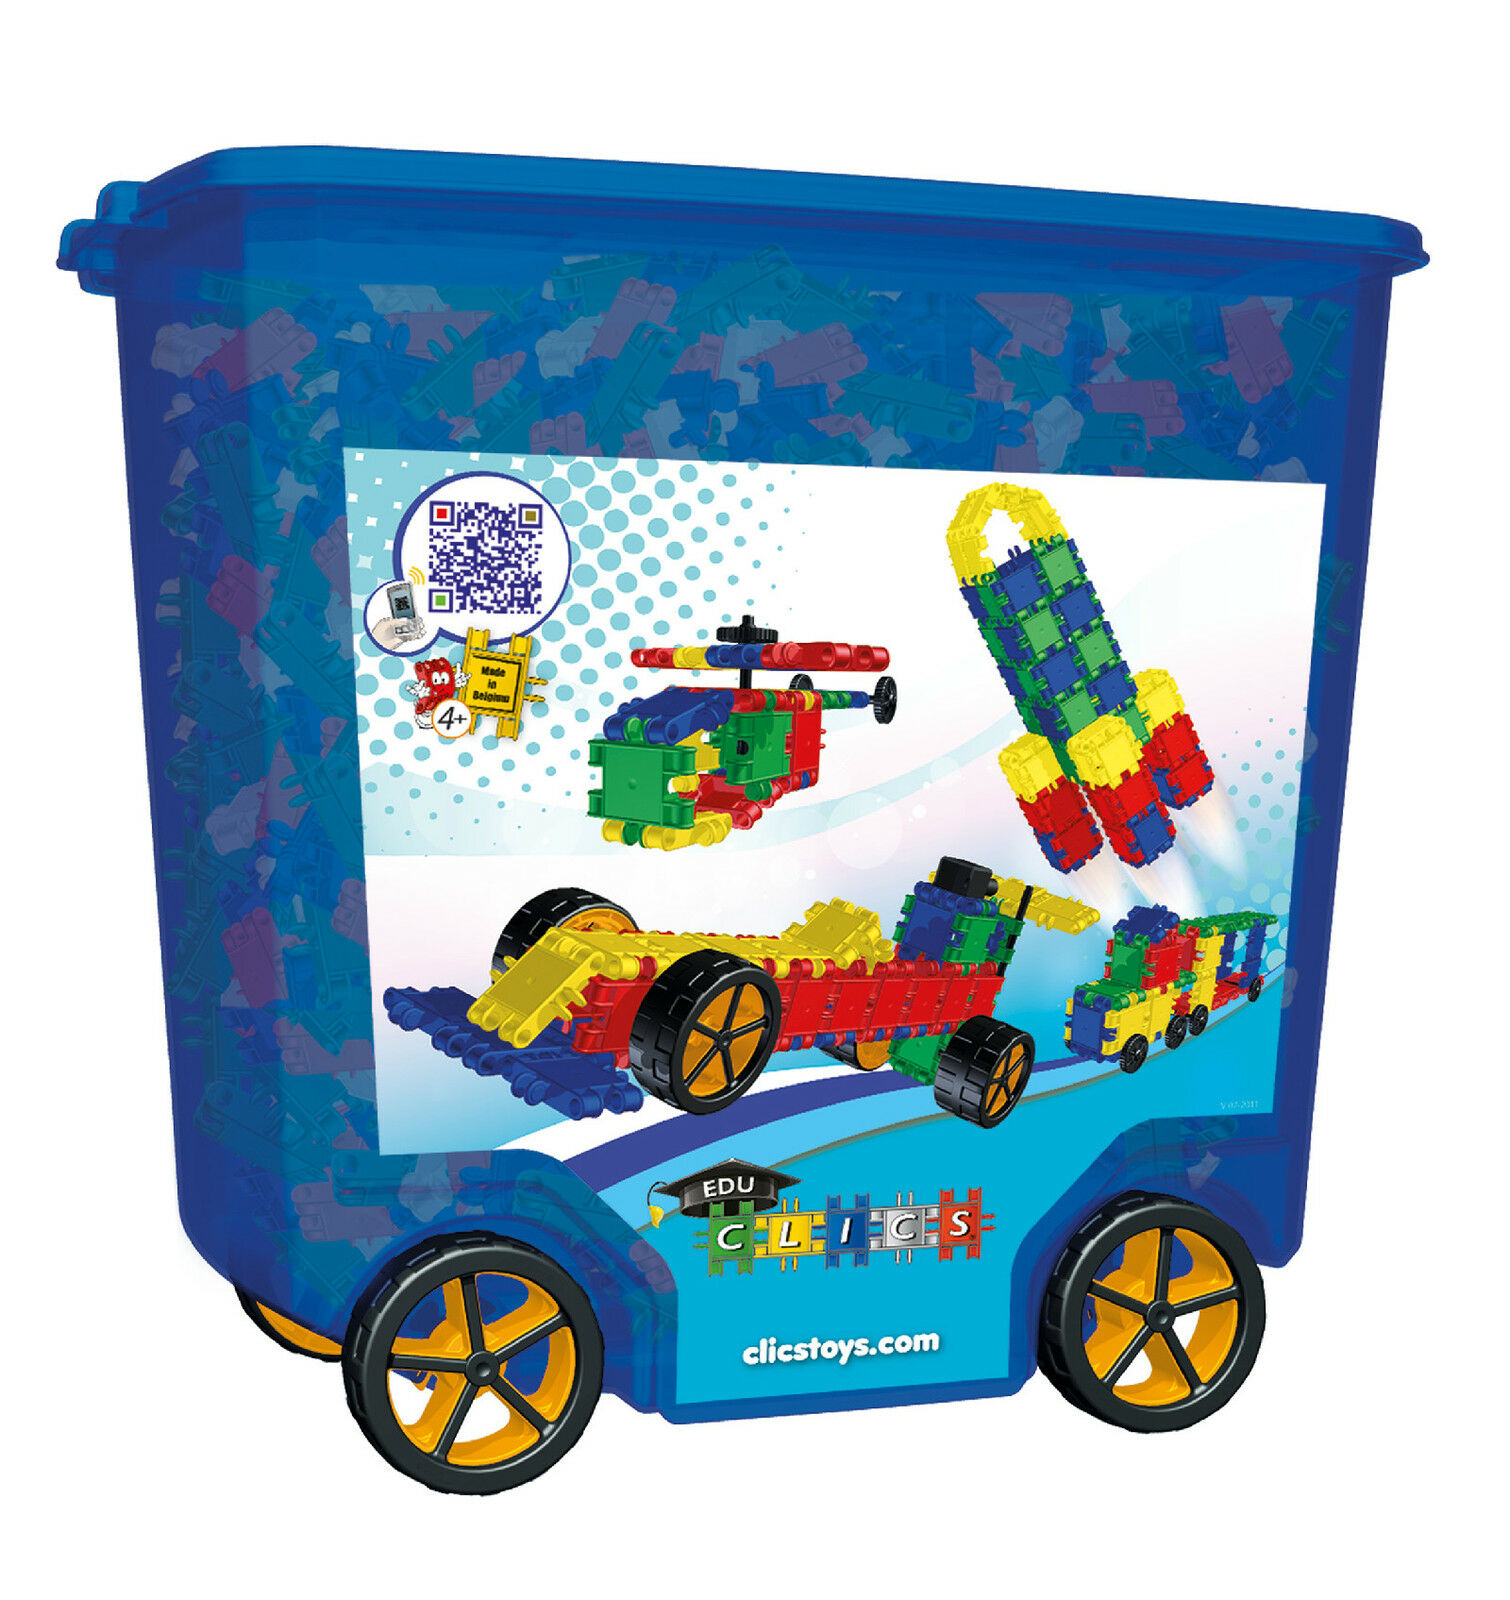 Clics Rollerbox Building Toy - 700 Pieces   BIG Wheels